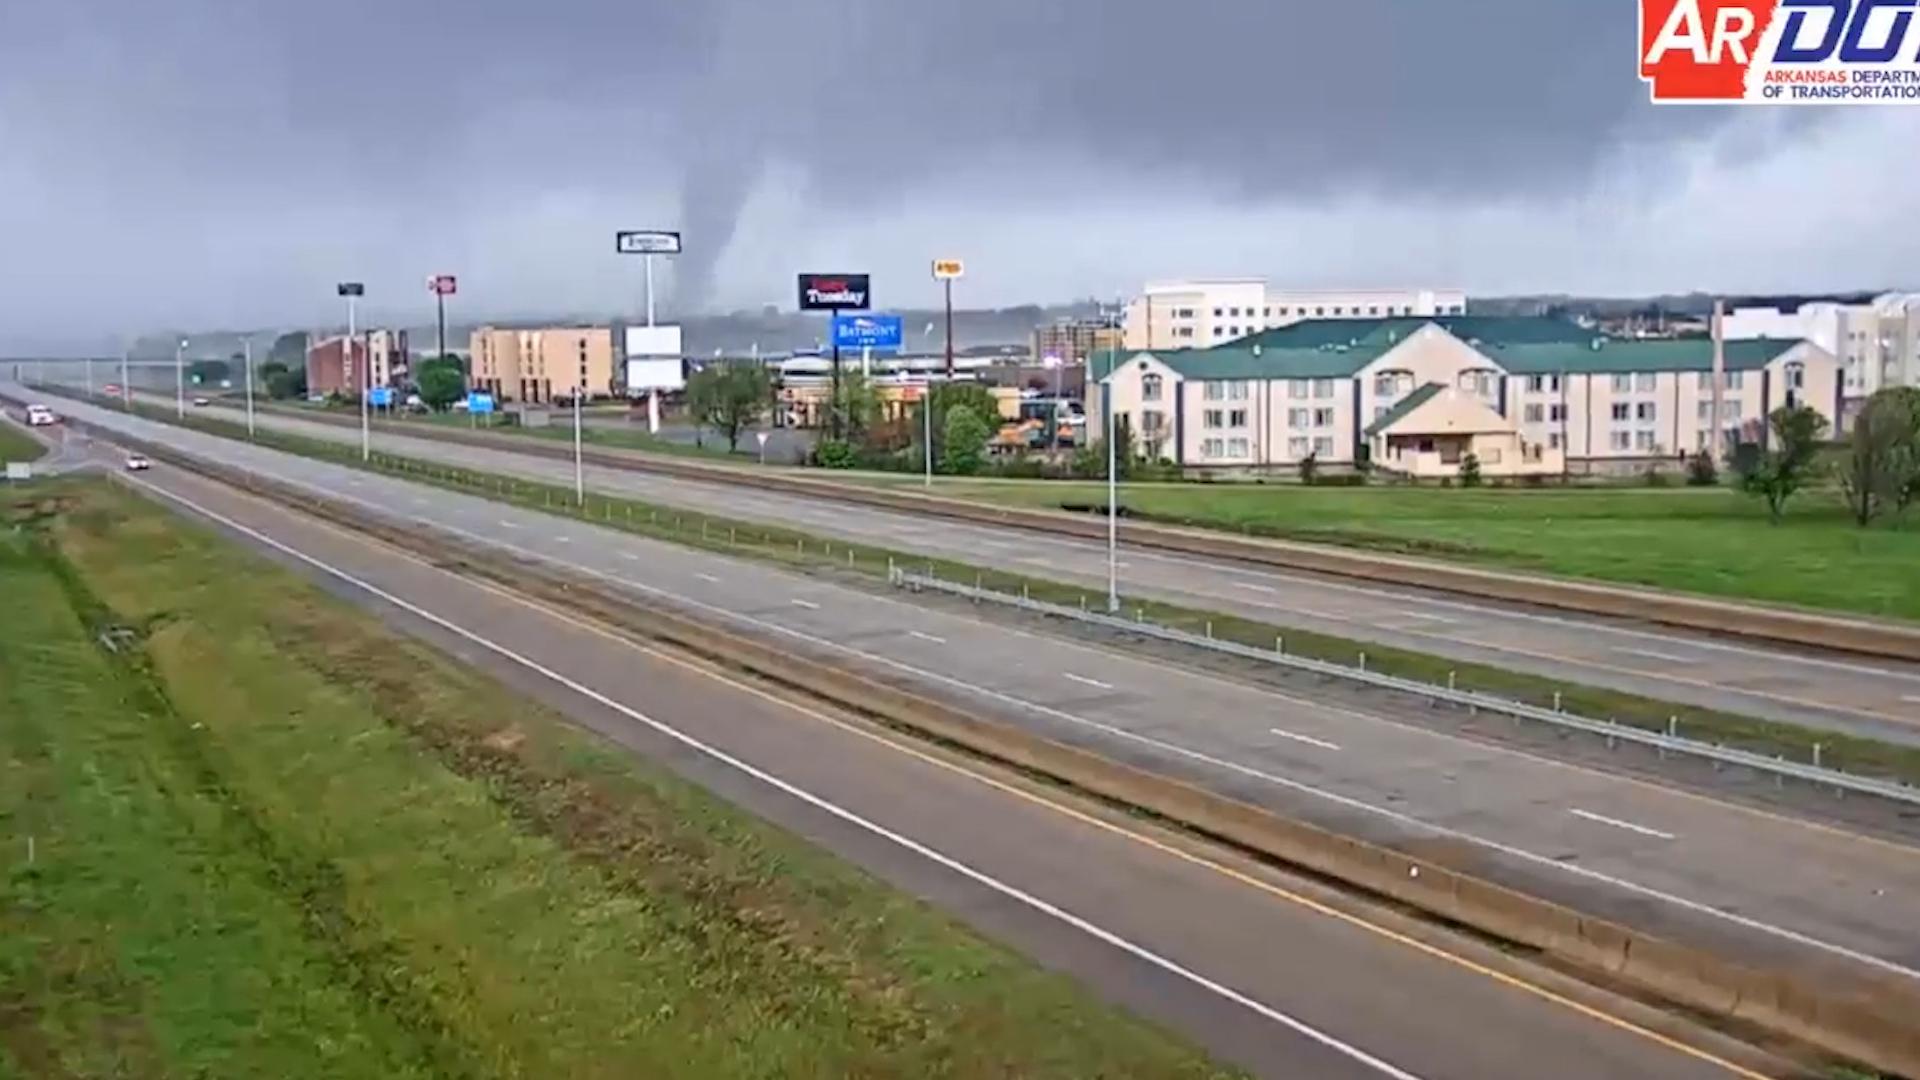 Large, destructive tornado strikes Jonesboro, Ark., leaving behind 'severe' damage